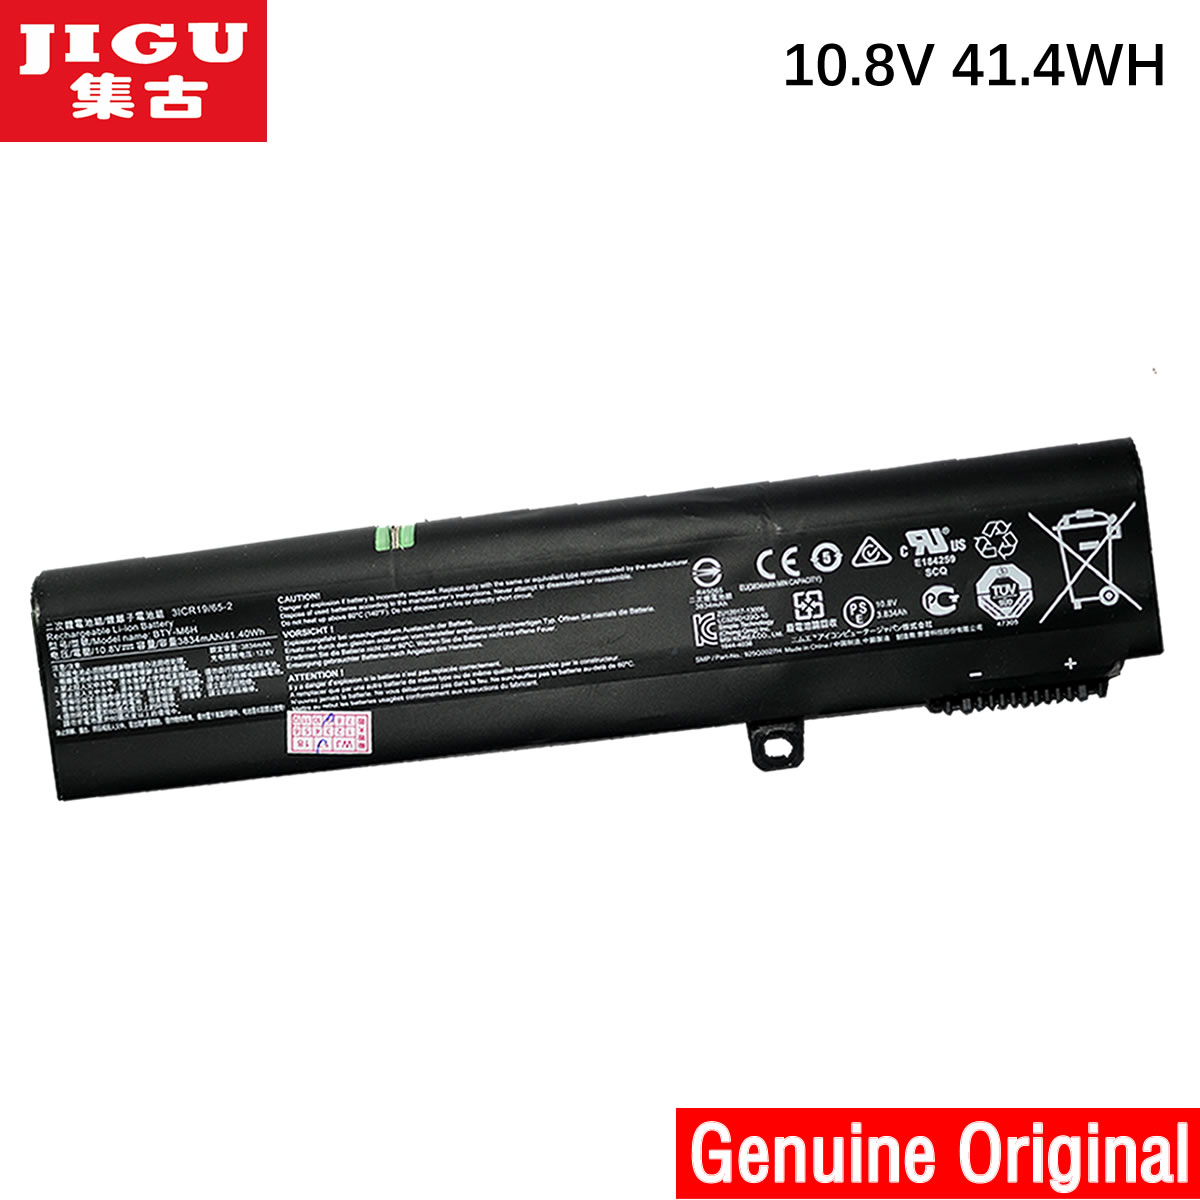 JIGU ORIGNAL Laptop Battery 3ICR19/65-2 3ICR19/66-2 BTY-M6H FOR MSI  GL62M GL72 GP62 GP62MVR 0016J9-083 GE62 GE72